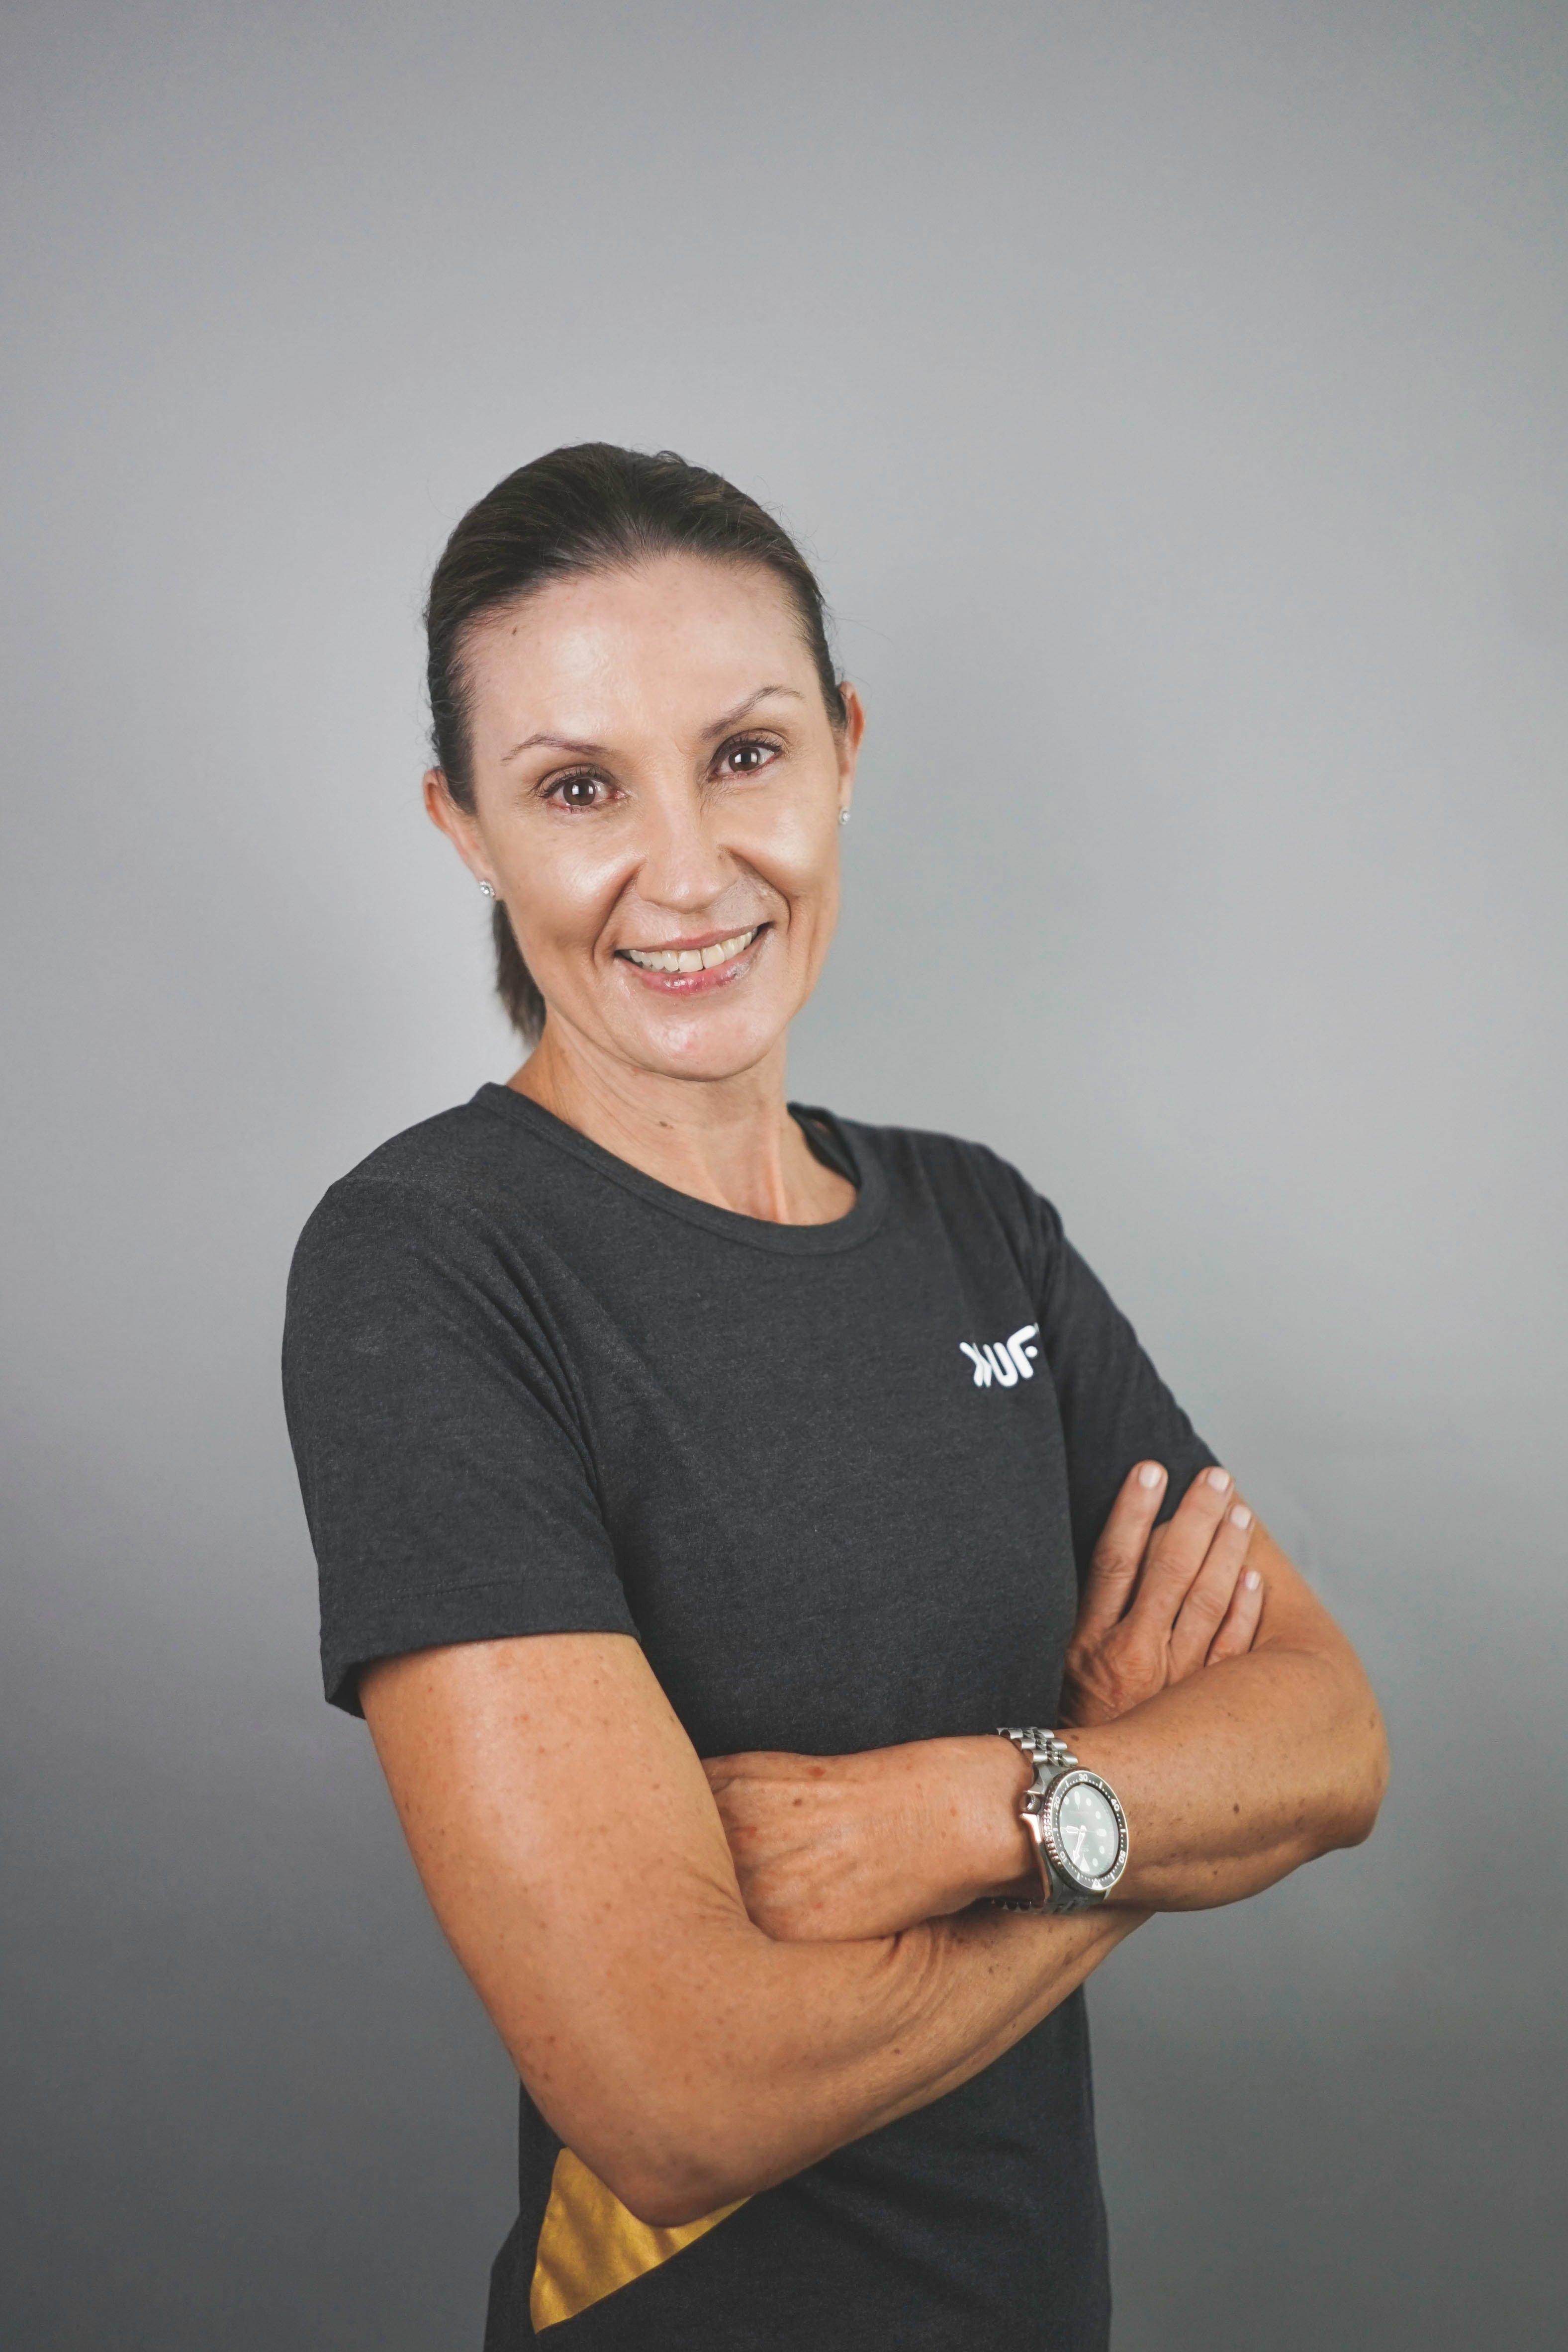 Bridget UFIT Group Class Coach